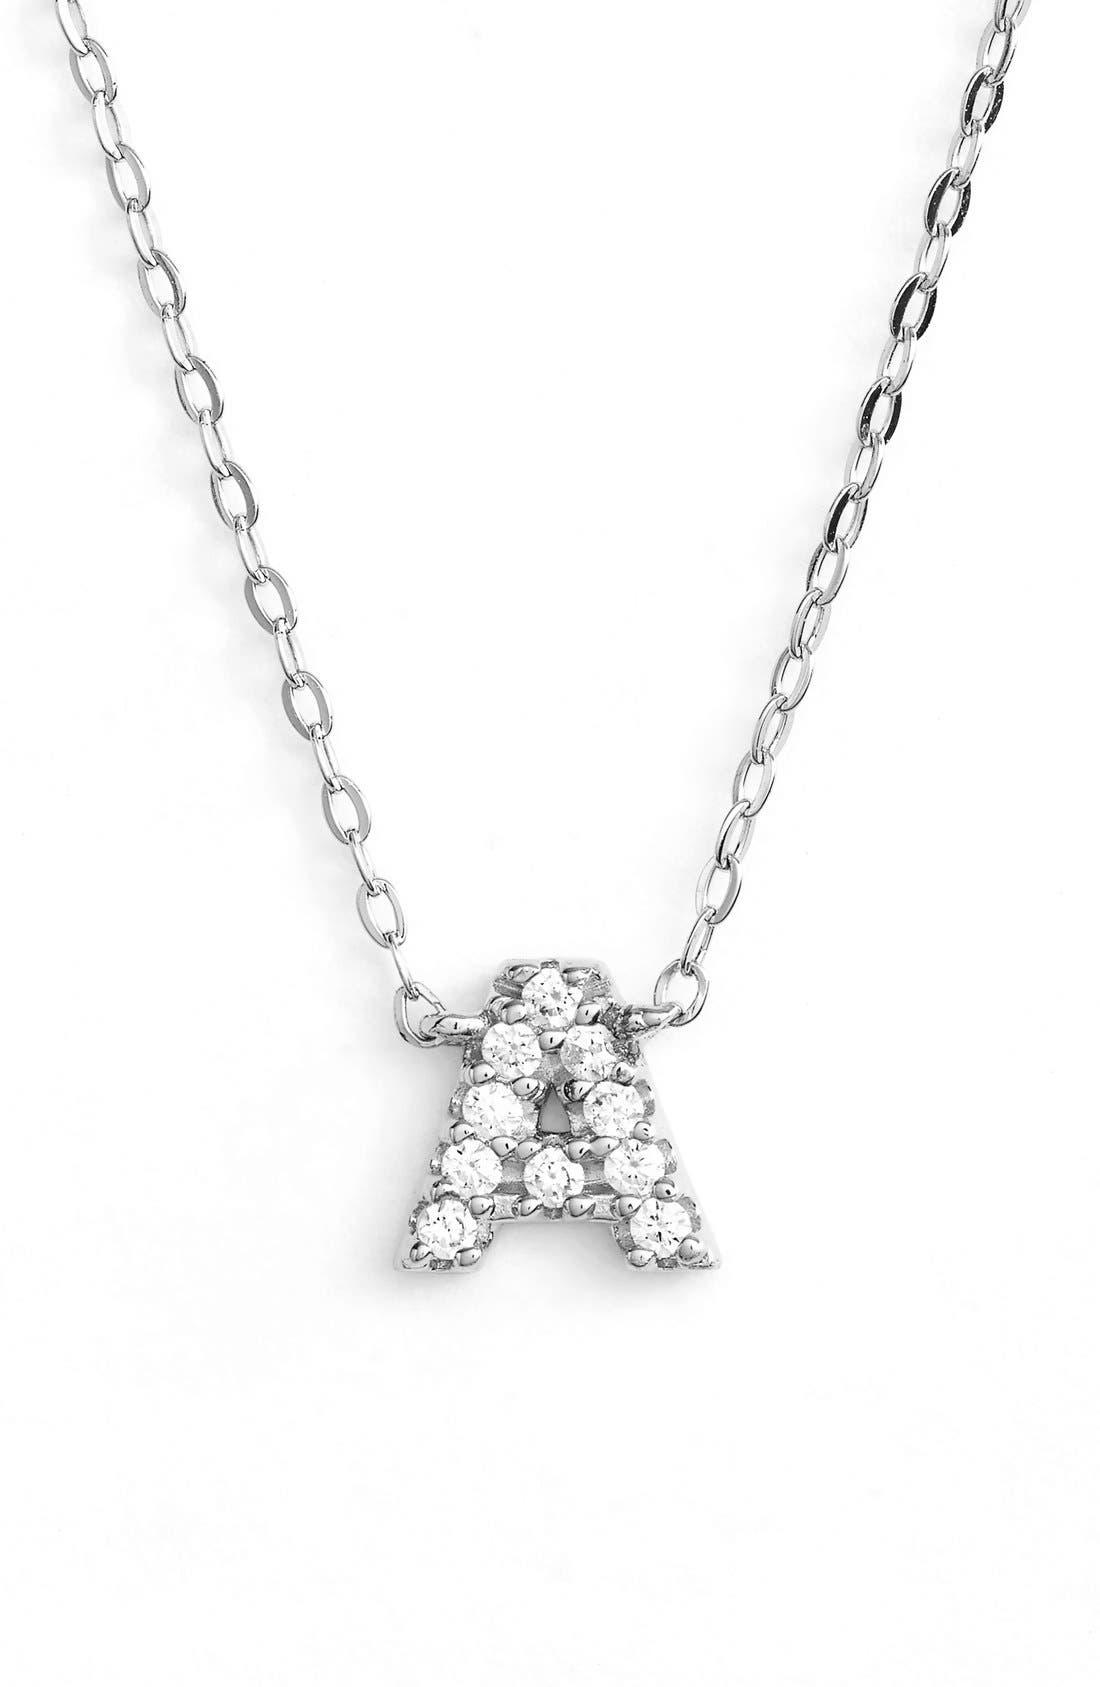 Cubic Zirconia Initial Pendant Necklace,                             Main thumbnail 1, color,                             040